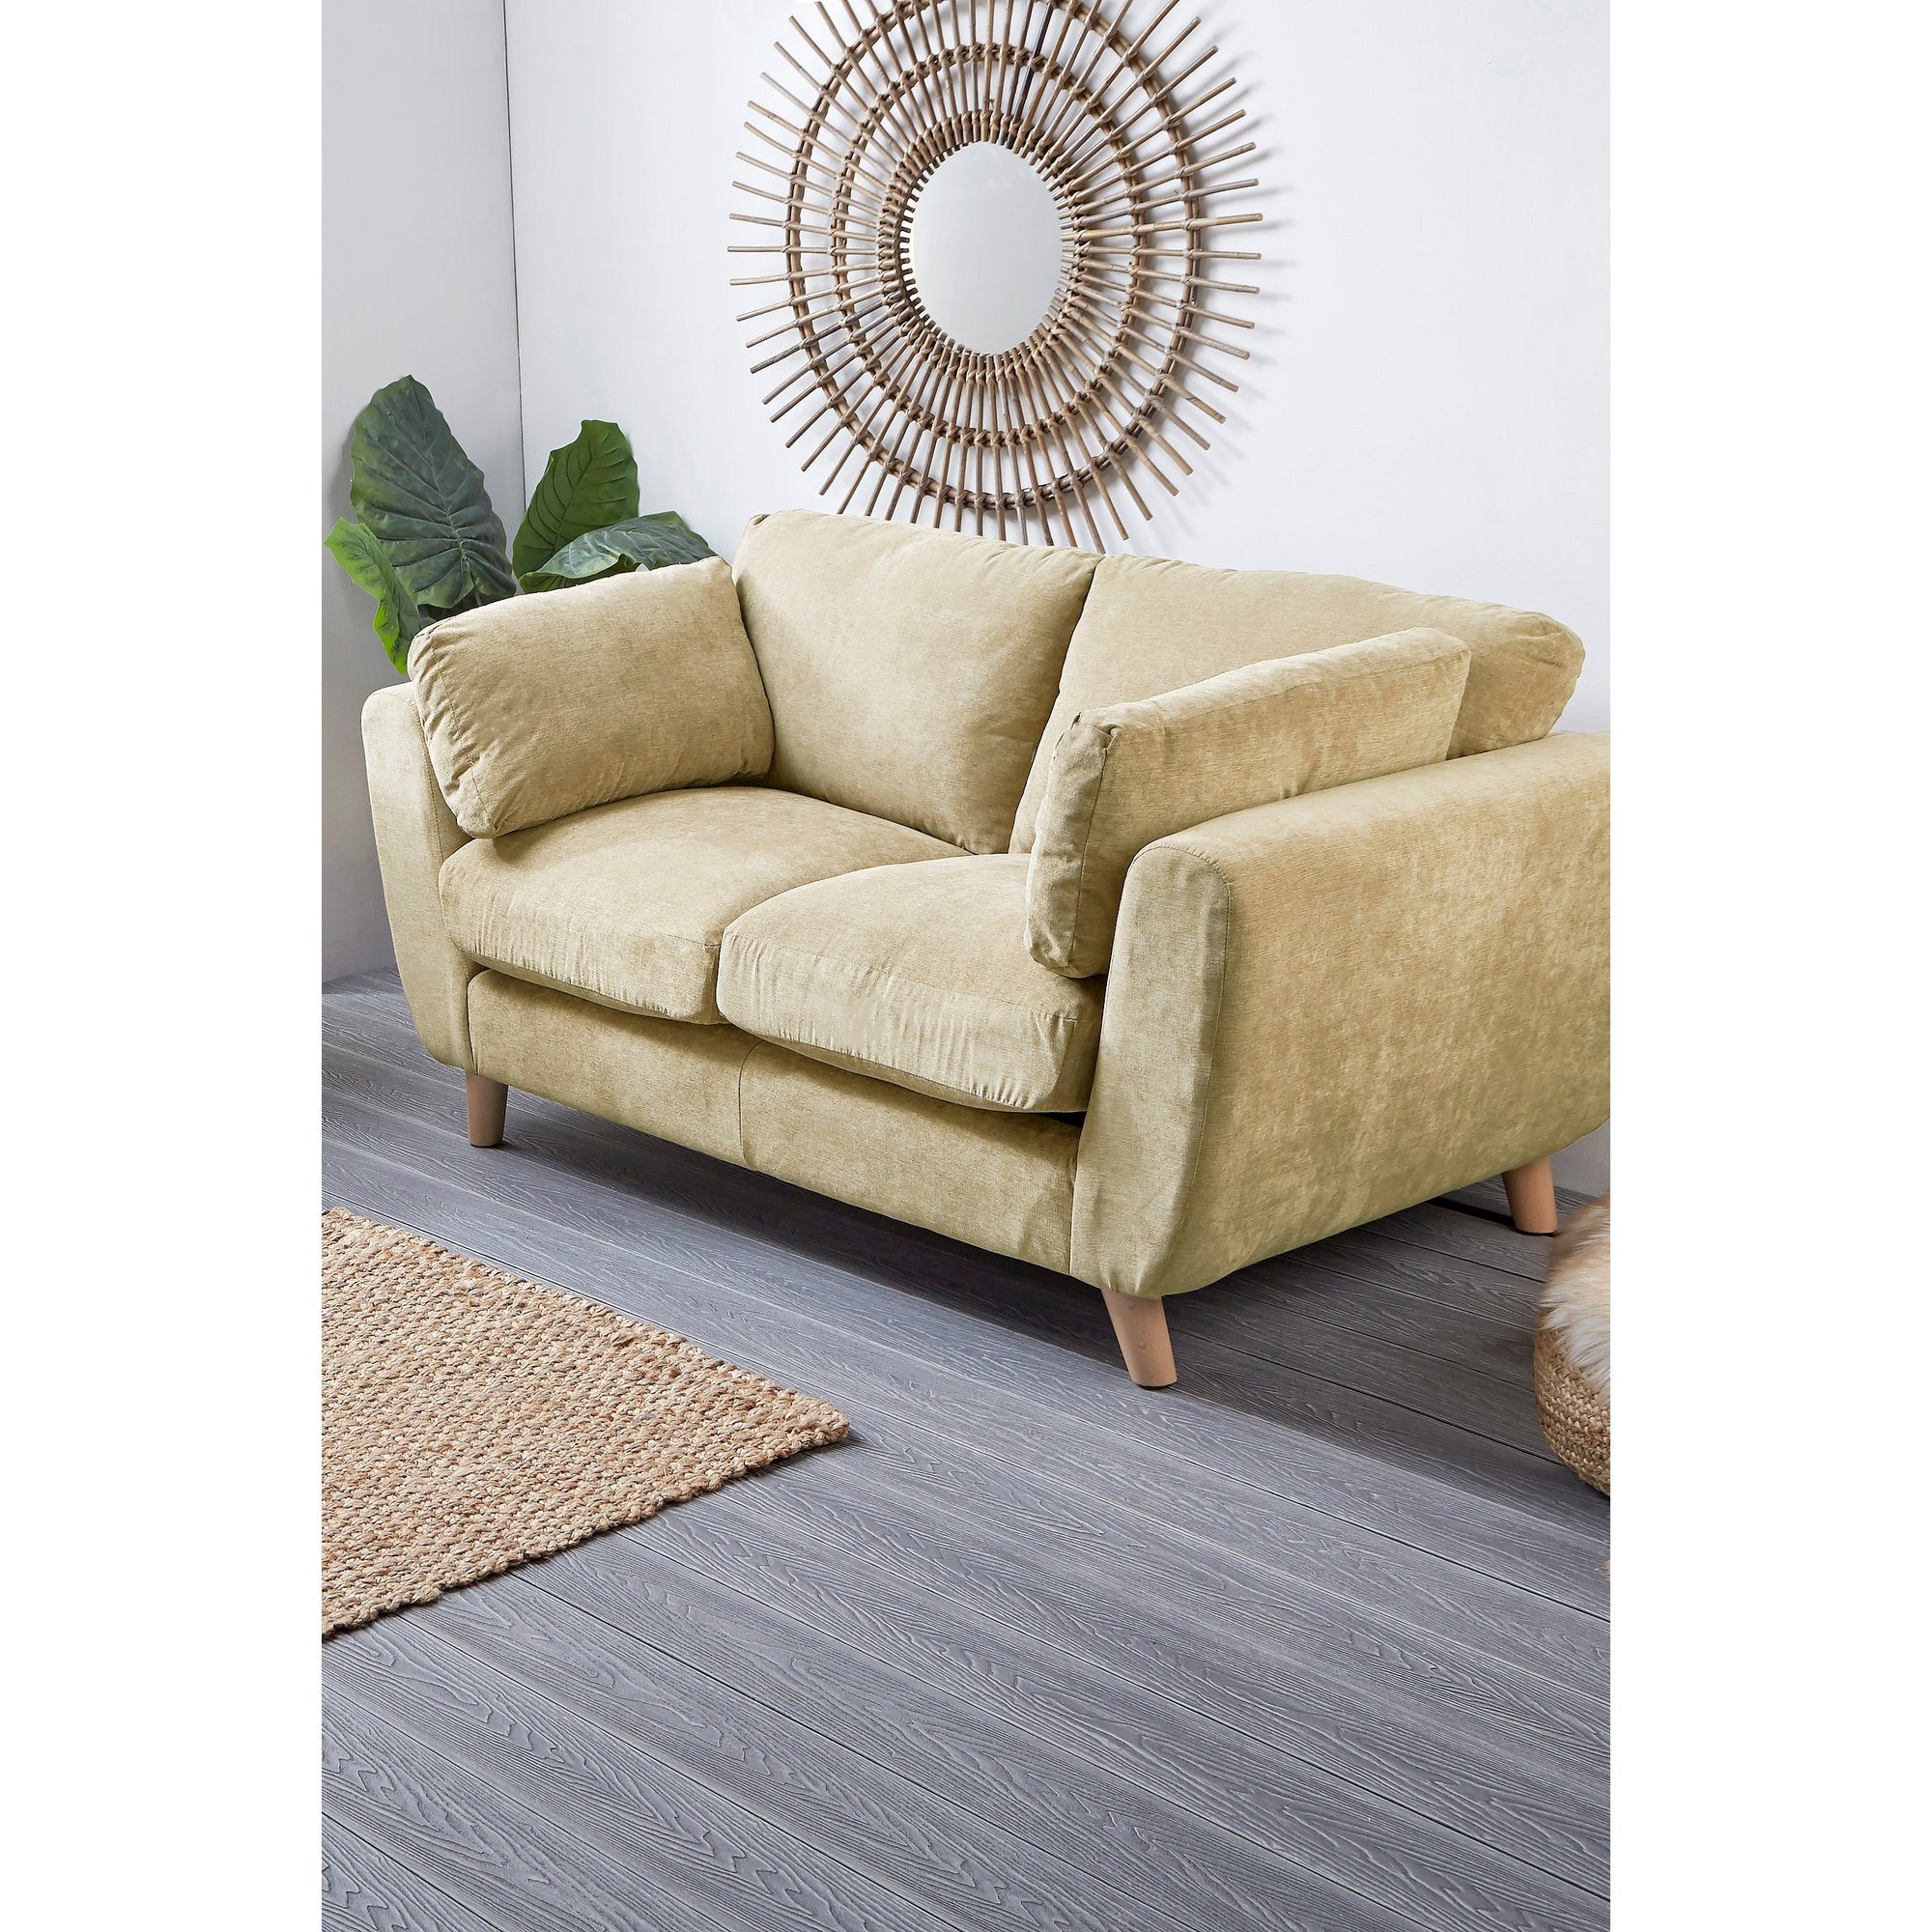 Image of Avon 2 Seater Sofa